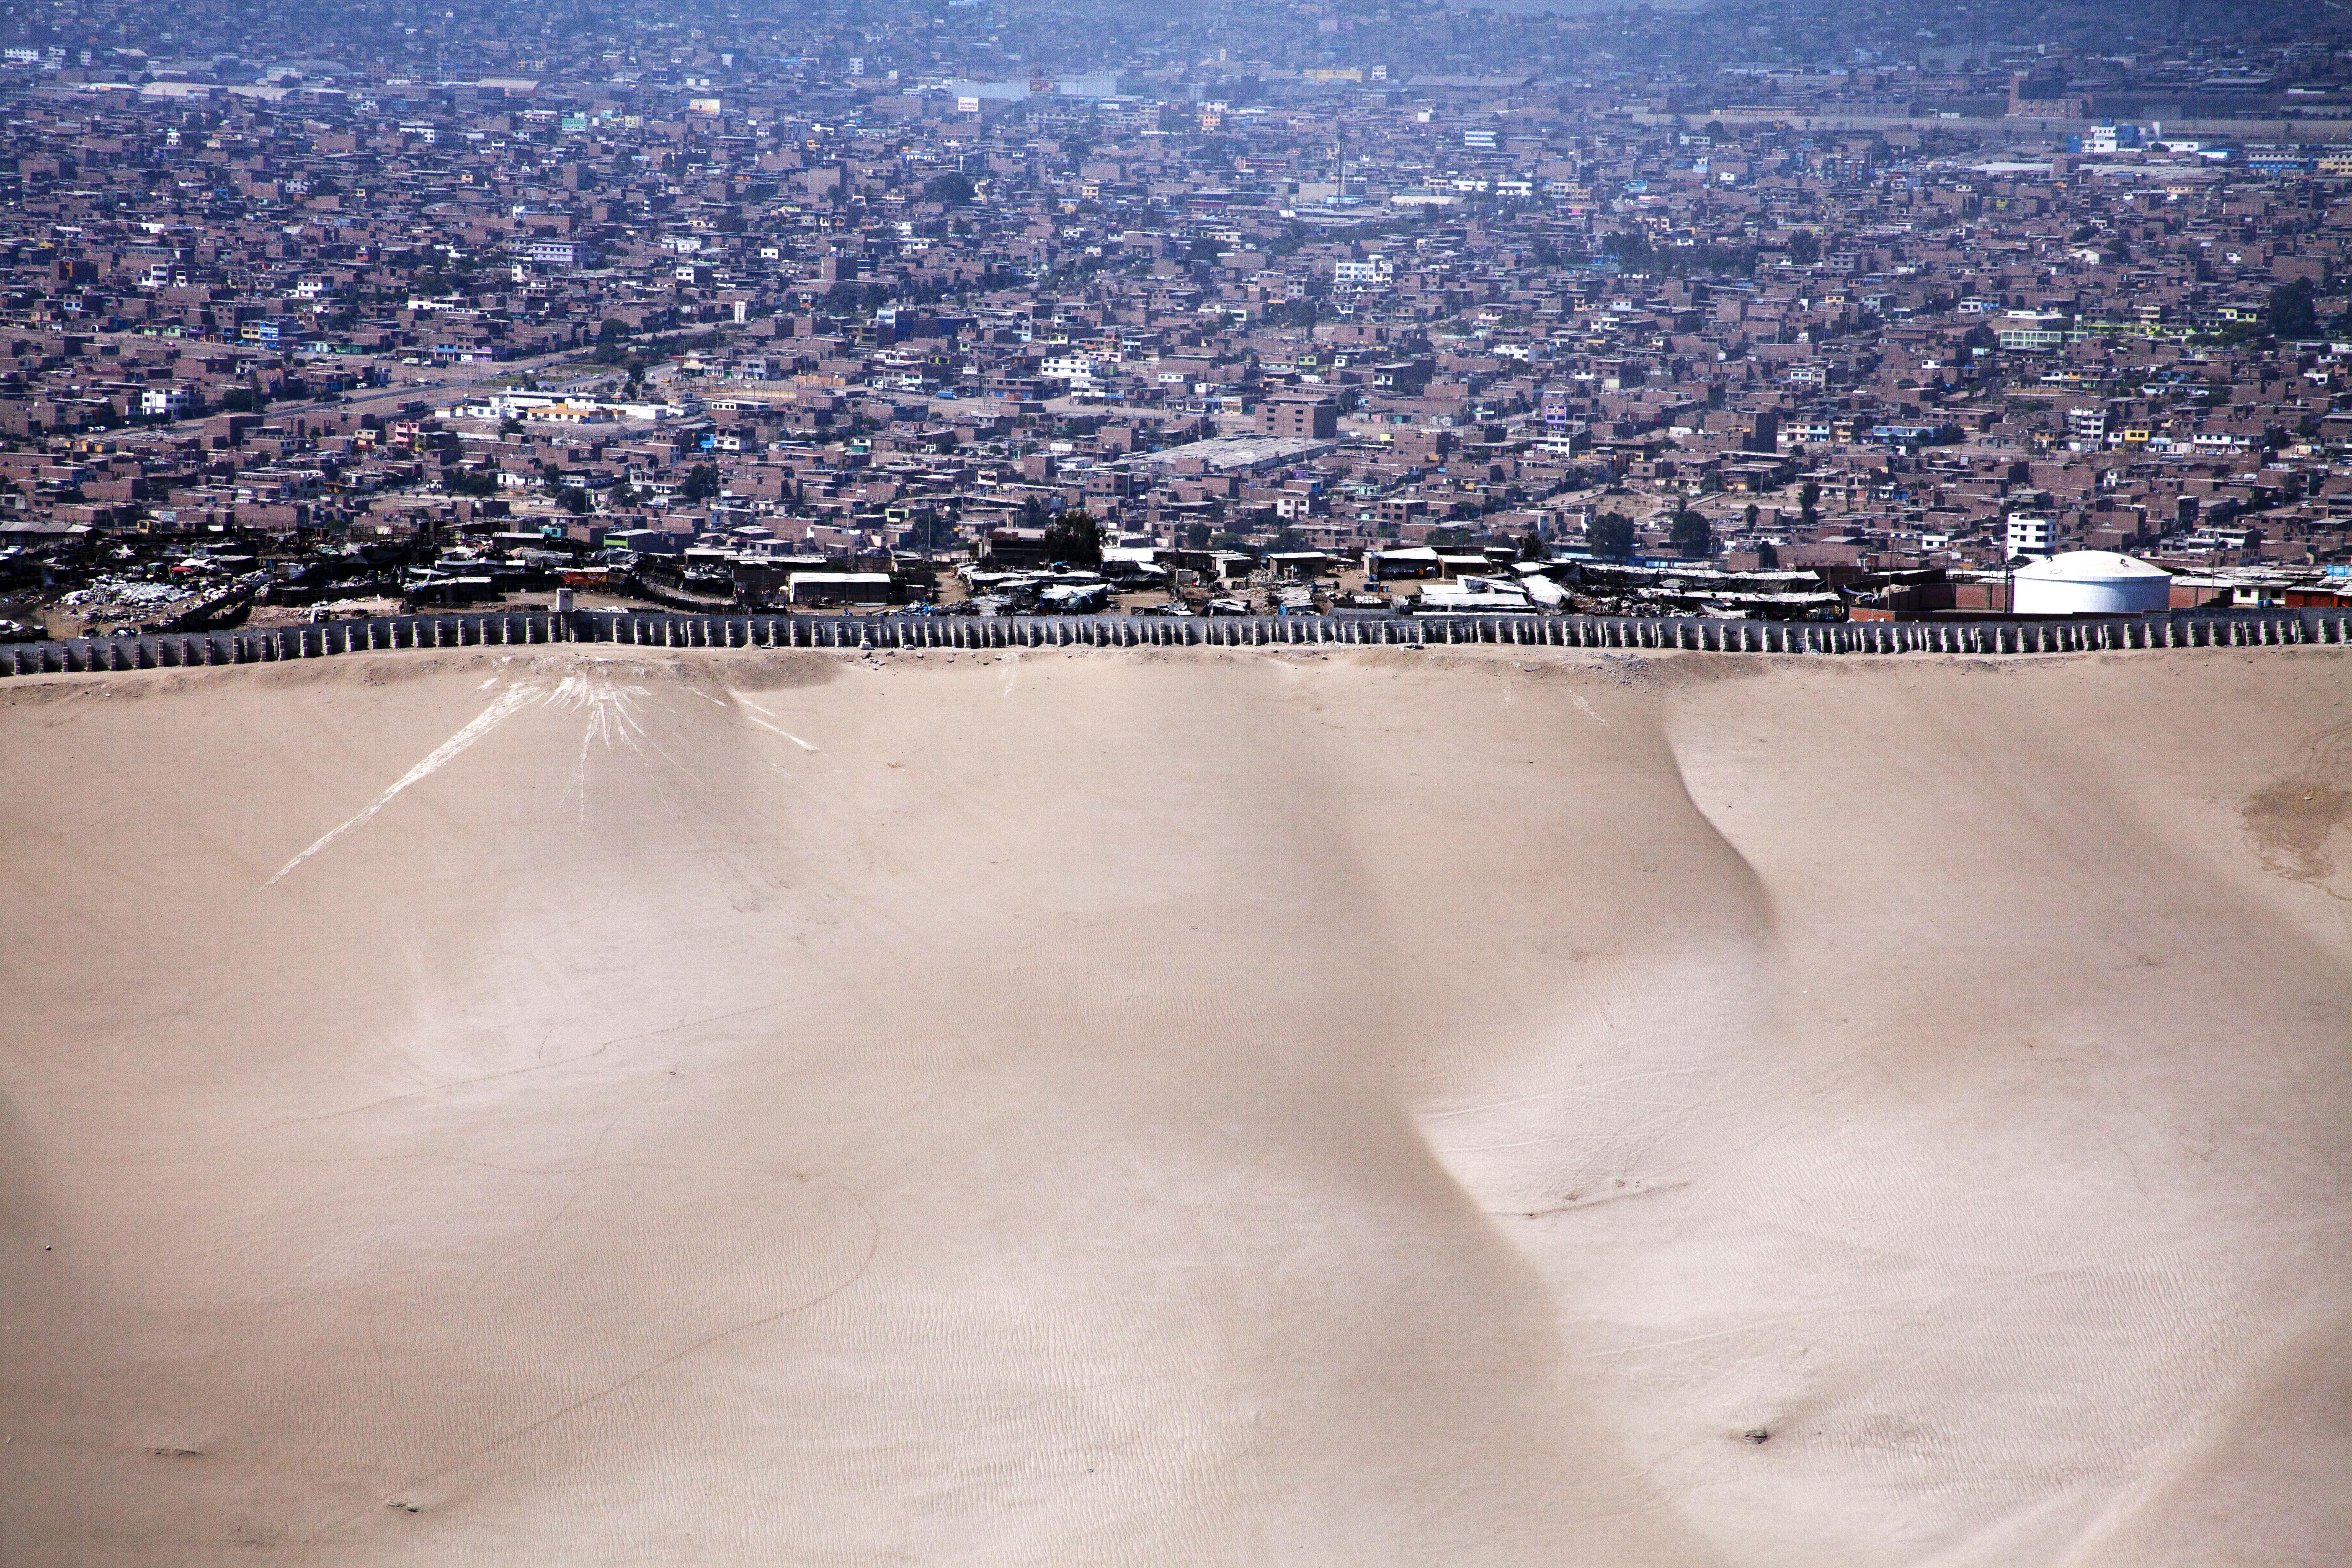 Seis hitos históricos de la gestión del agua que beneficia a Lima